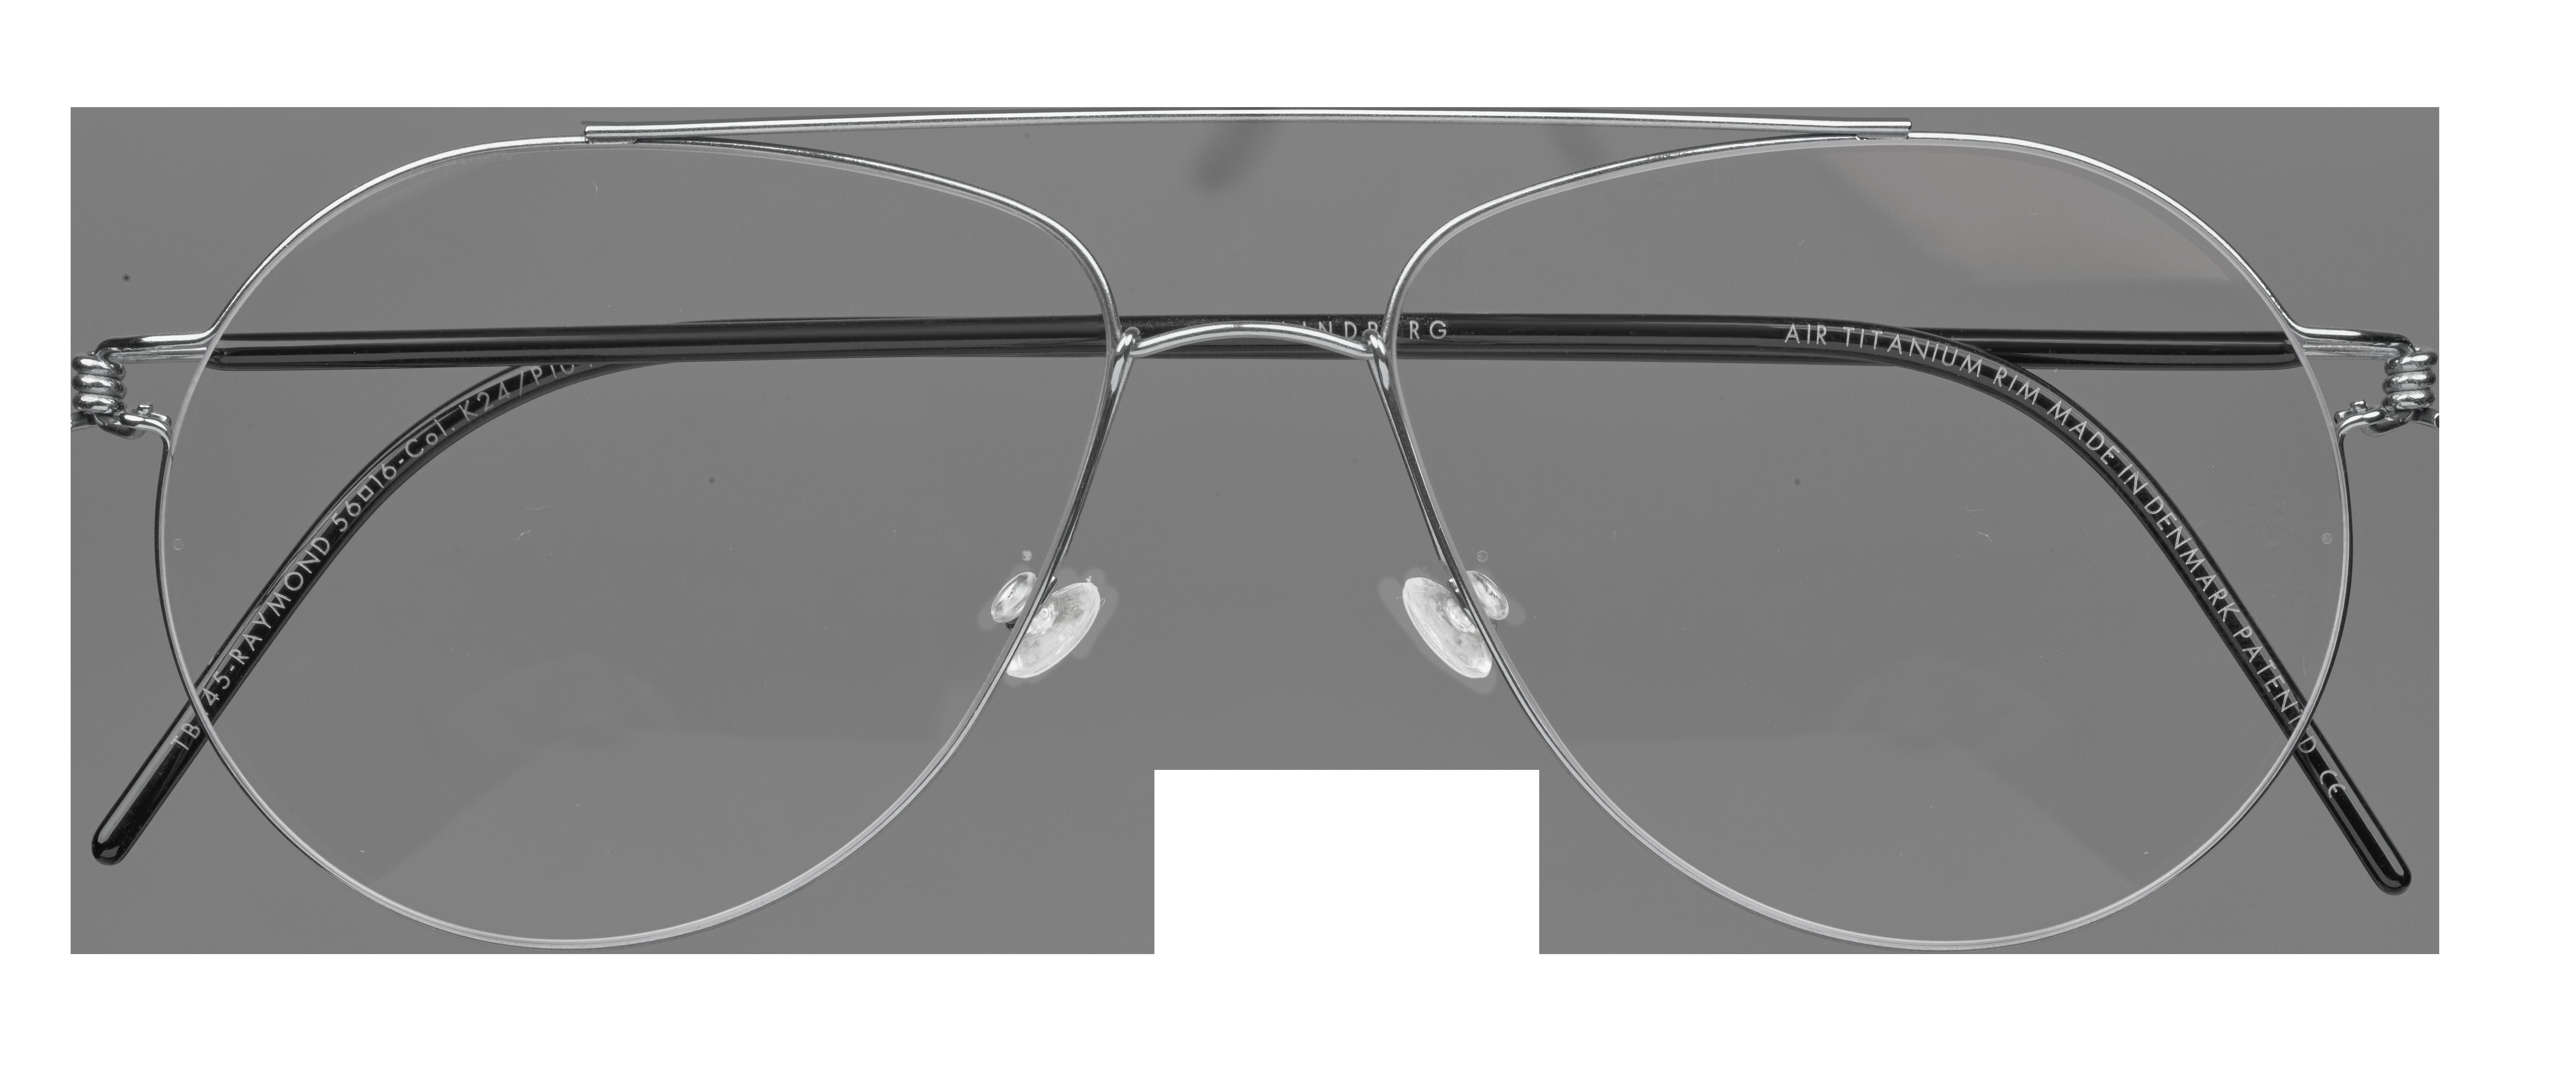 c7f53ed25c2 Lindberg Spirit Rimless Eyeglasses « One More Soul